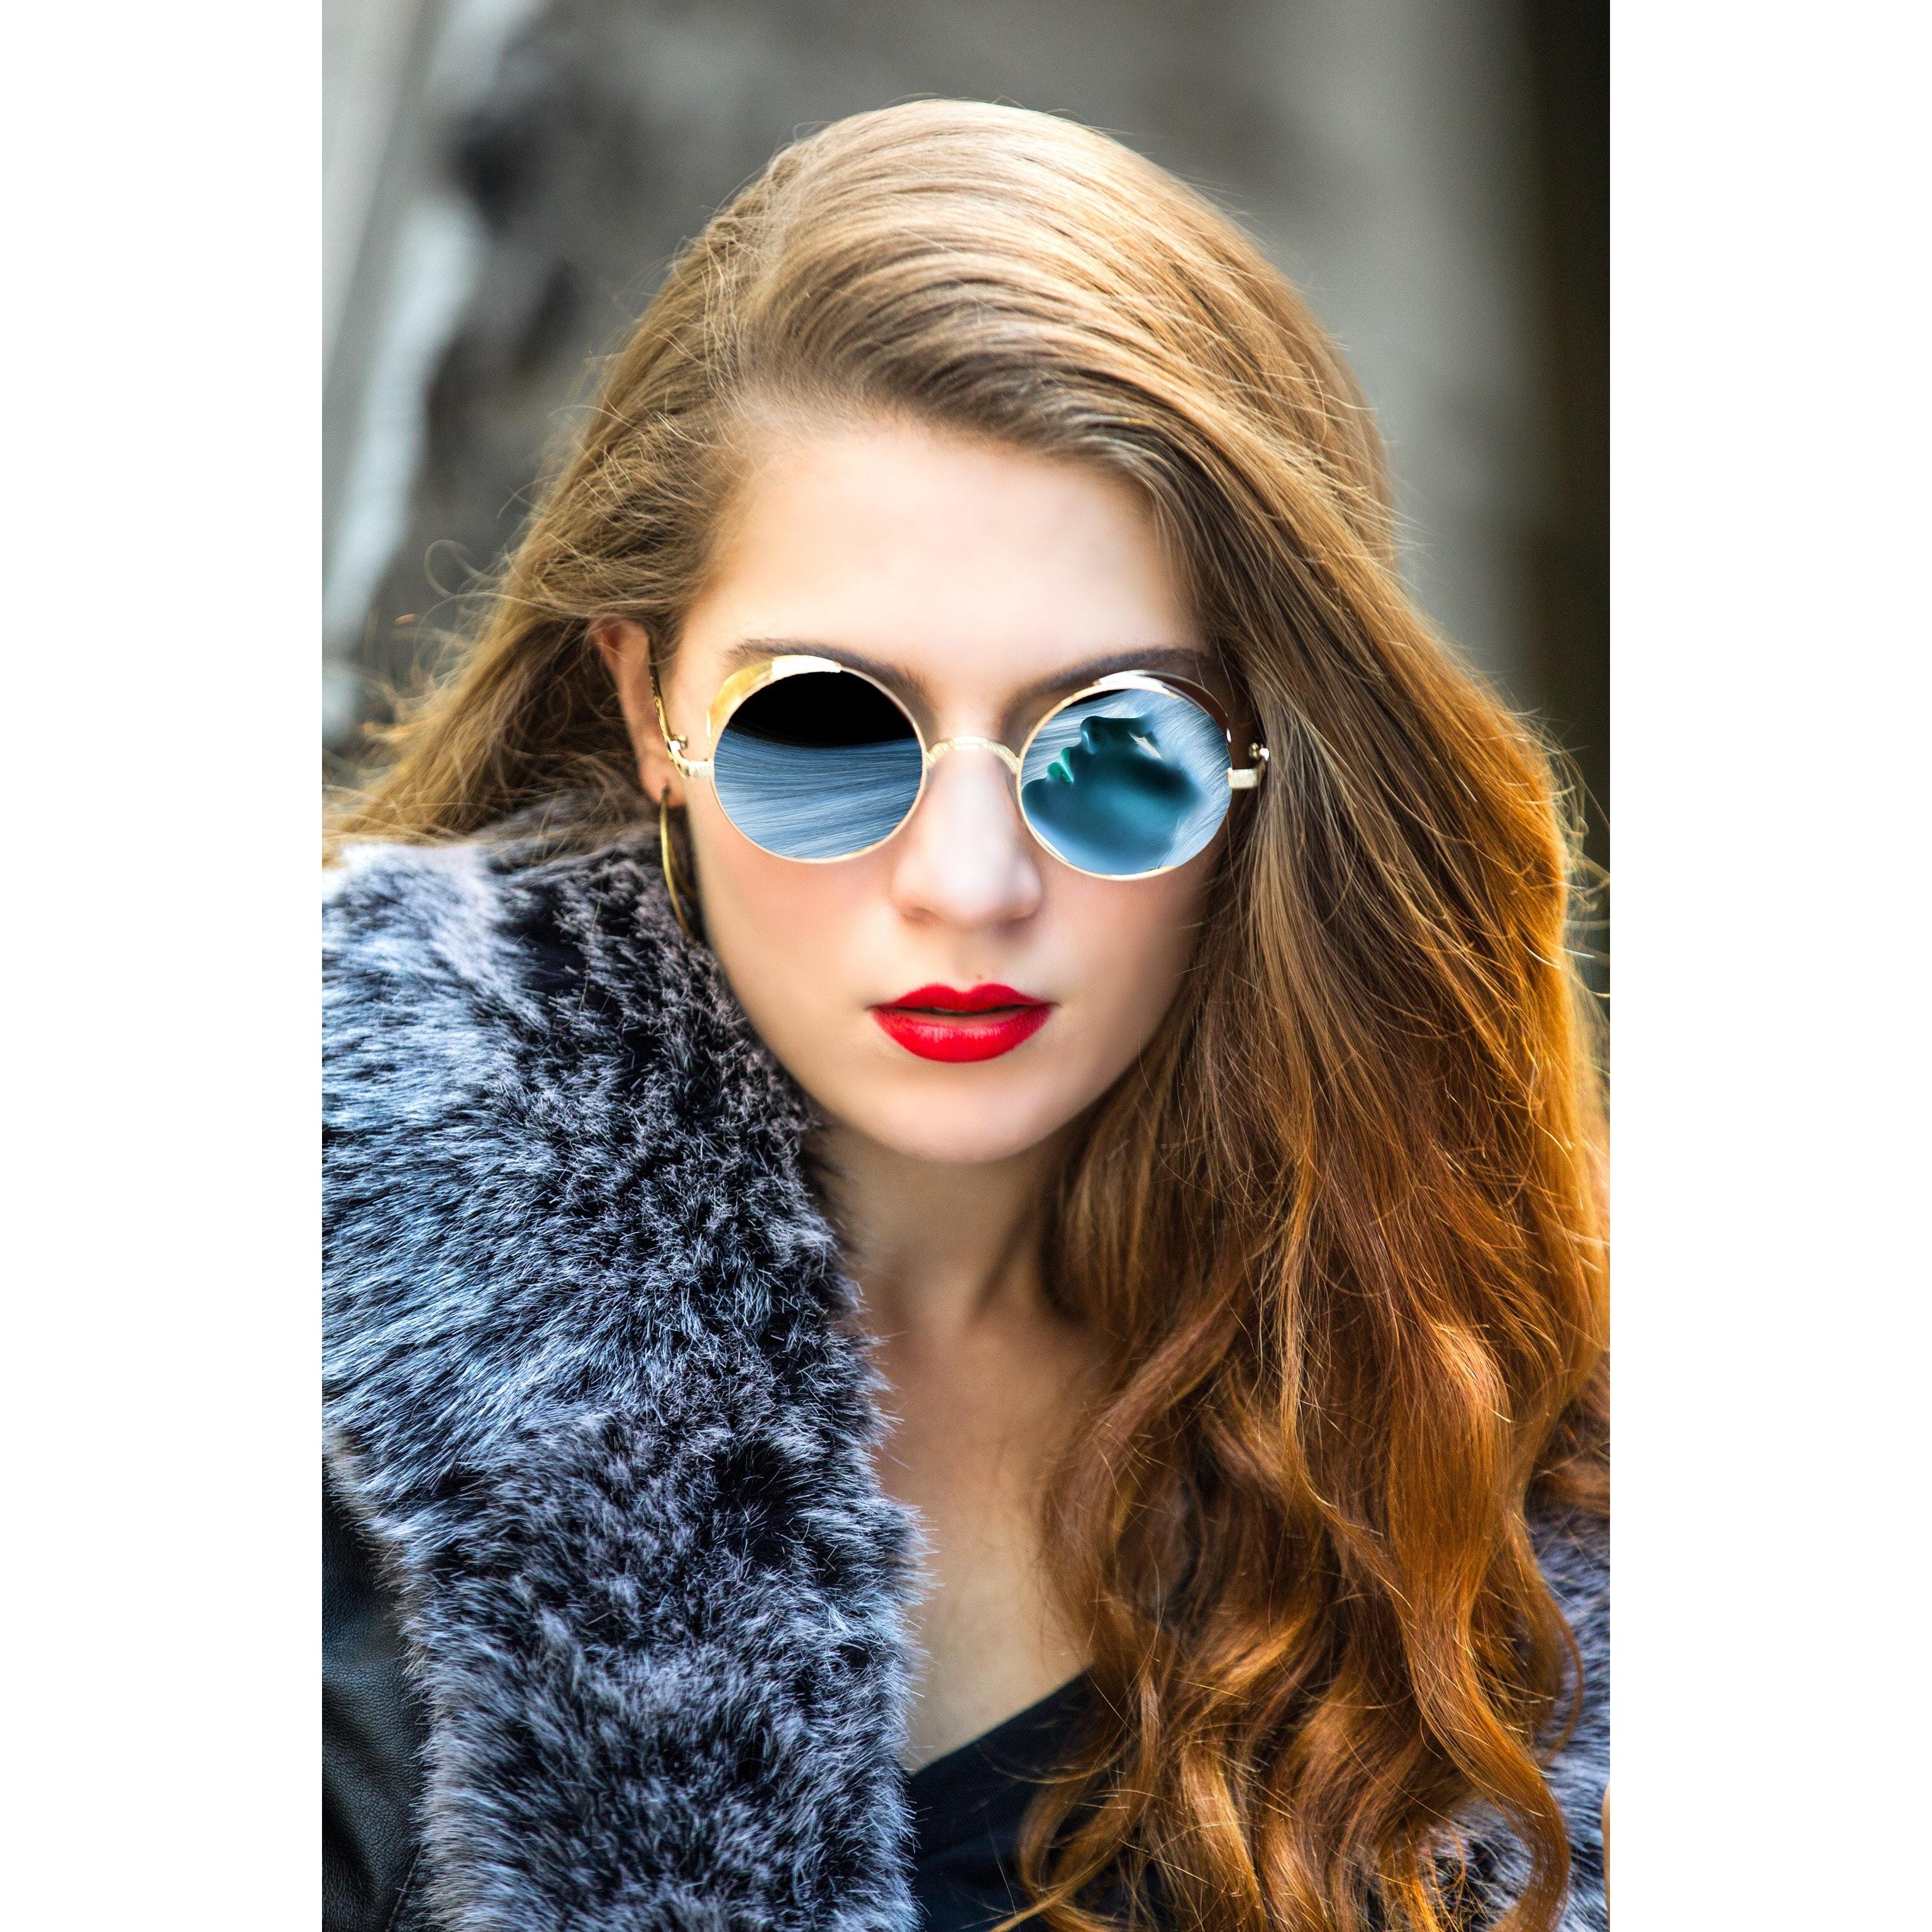 Woman Taking Selfie Wearing Round Blue Sunglasses, Attractive, Lips, Woman, Wear, HQ Photo